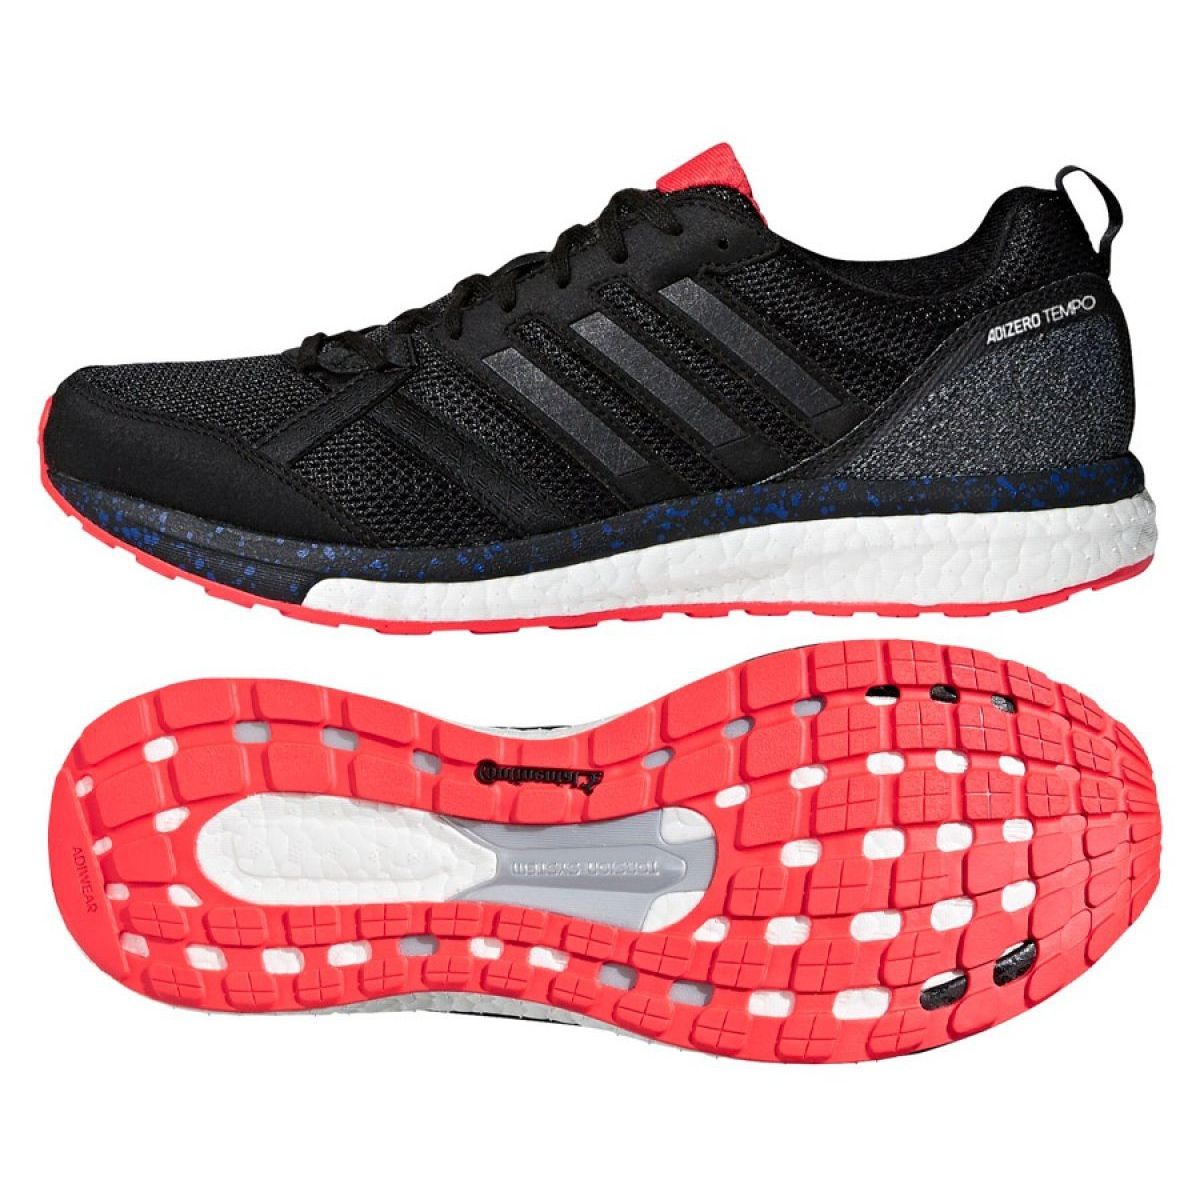 huge selection of f7f01 53982 Black Running shoes adidas Adizero Tempo 9 Akt M CP9367